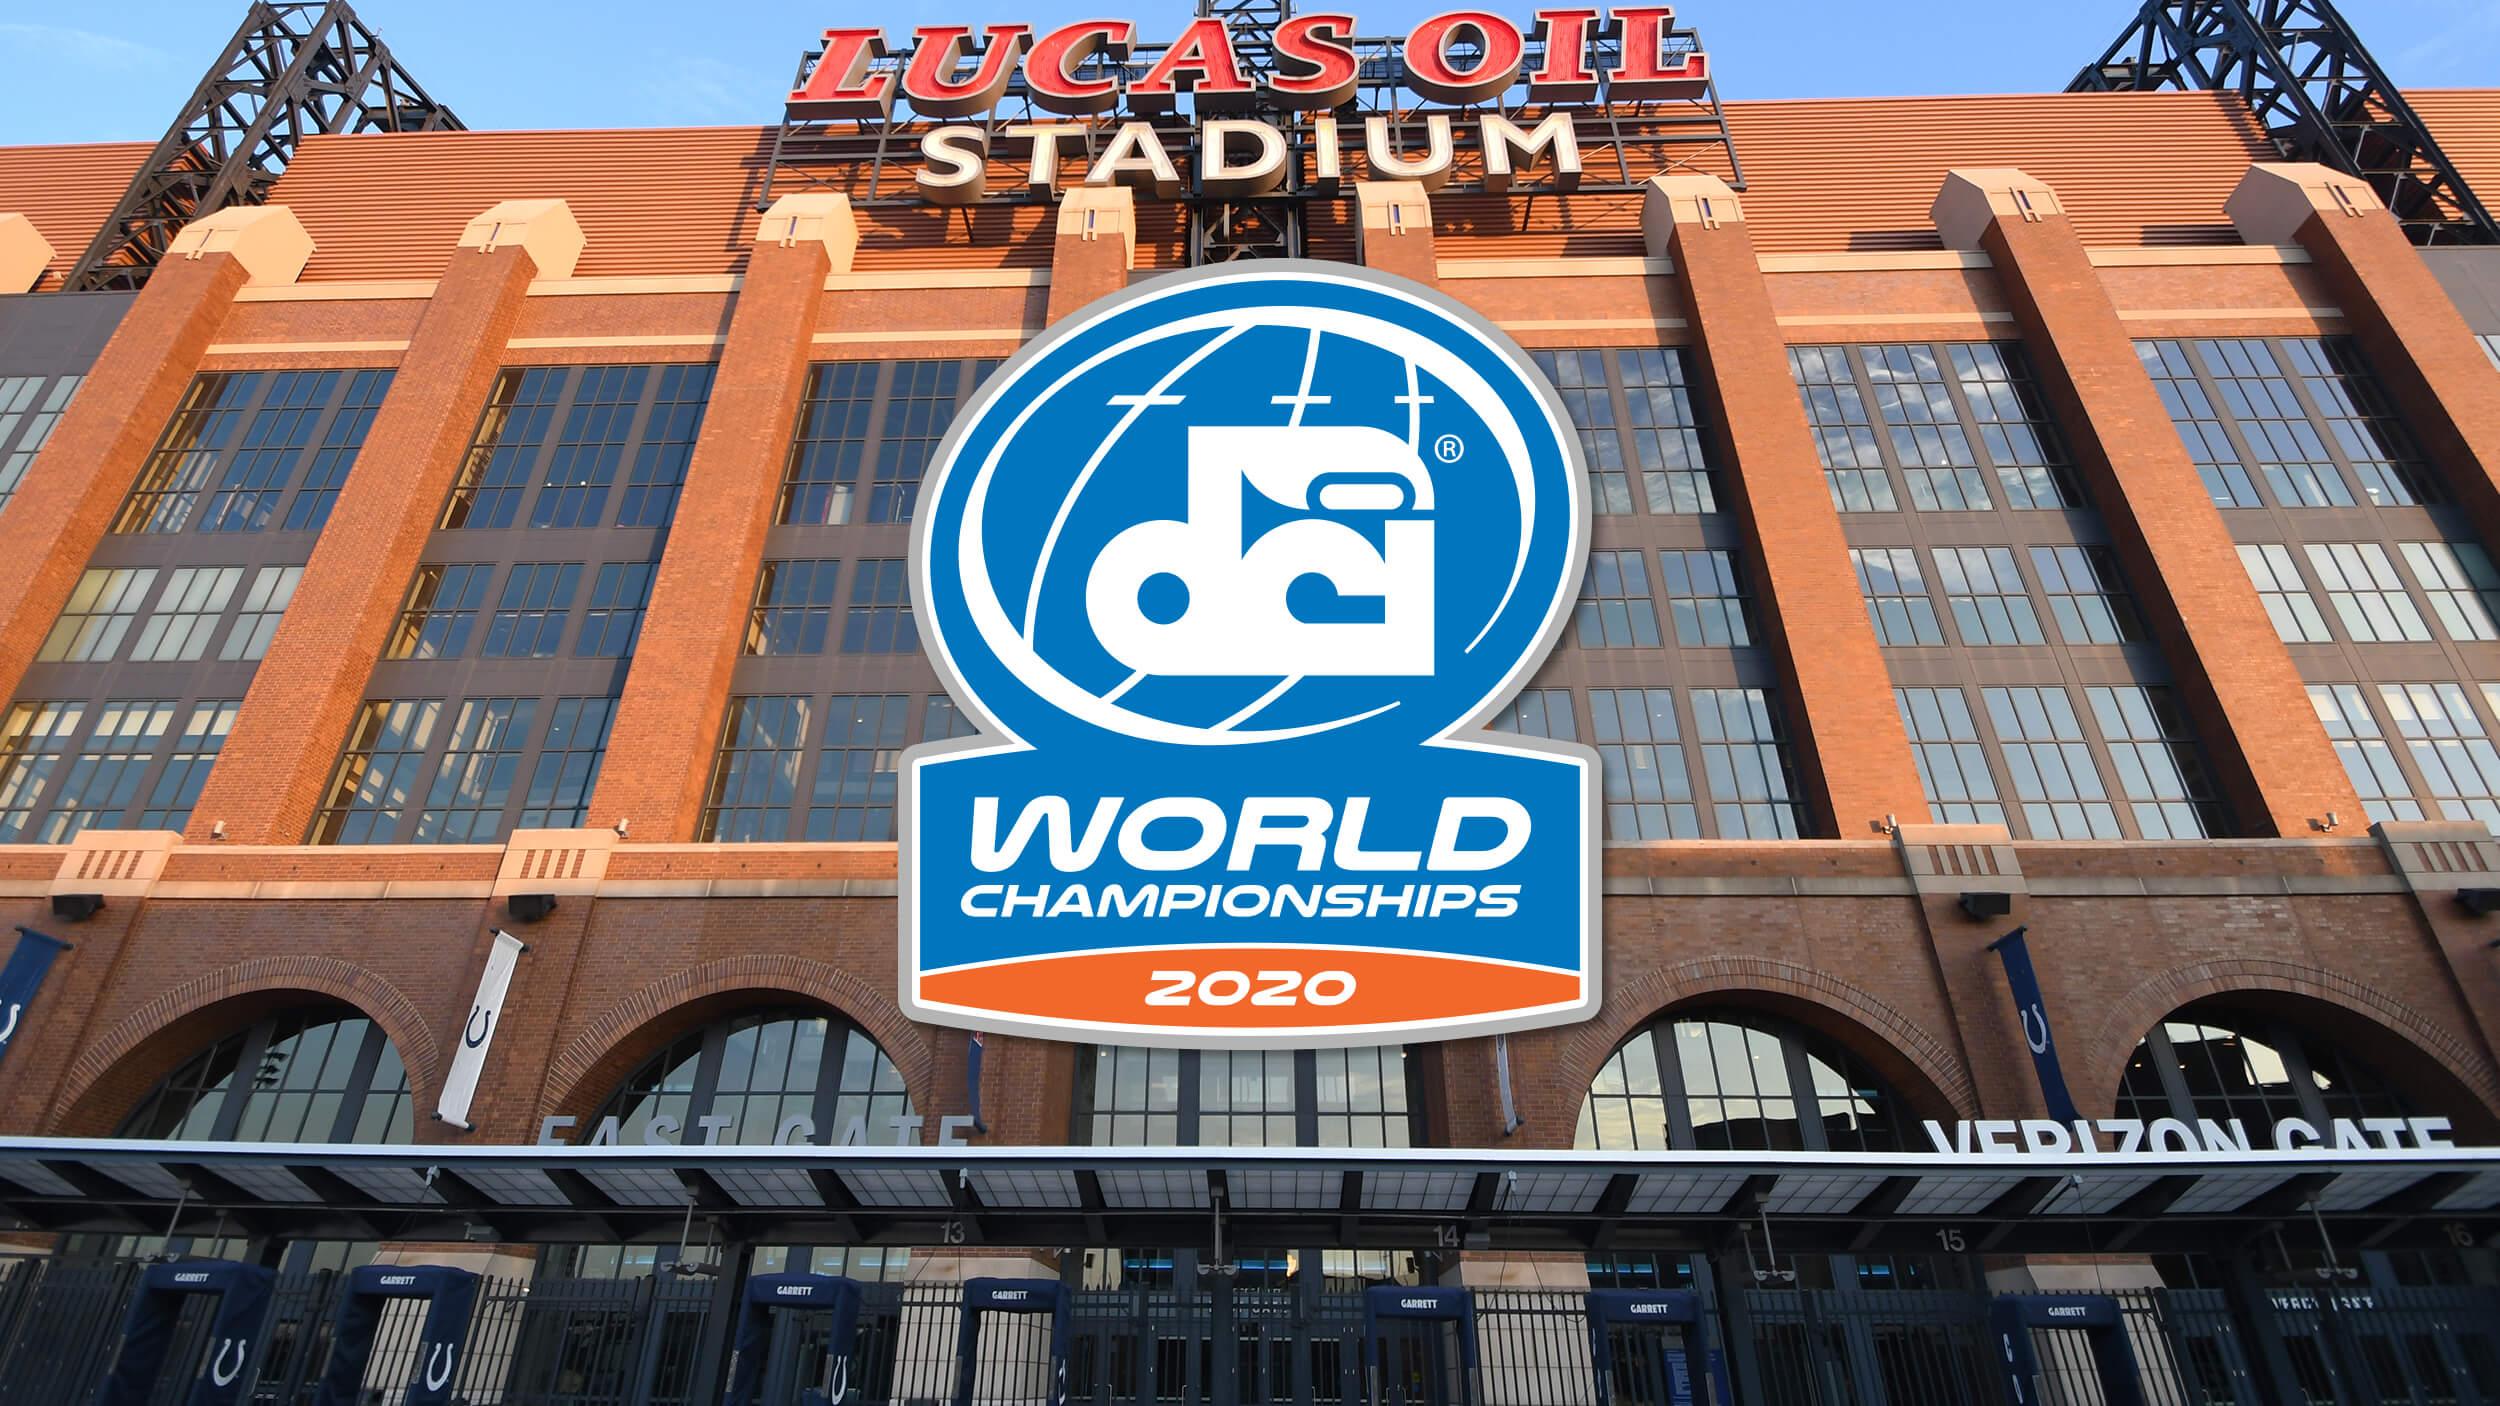 5 must-watch events of DCI Finals Week 2020